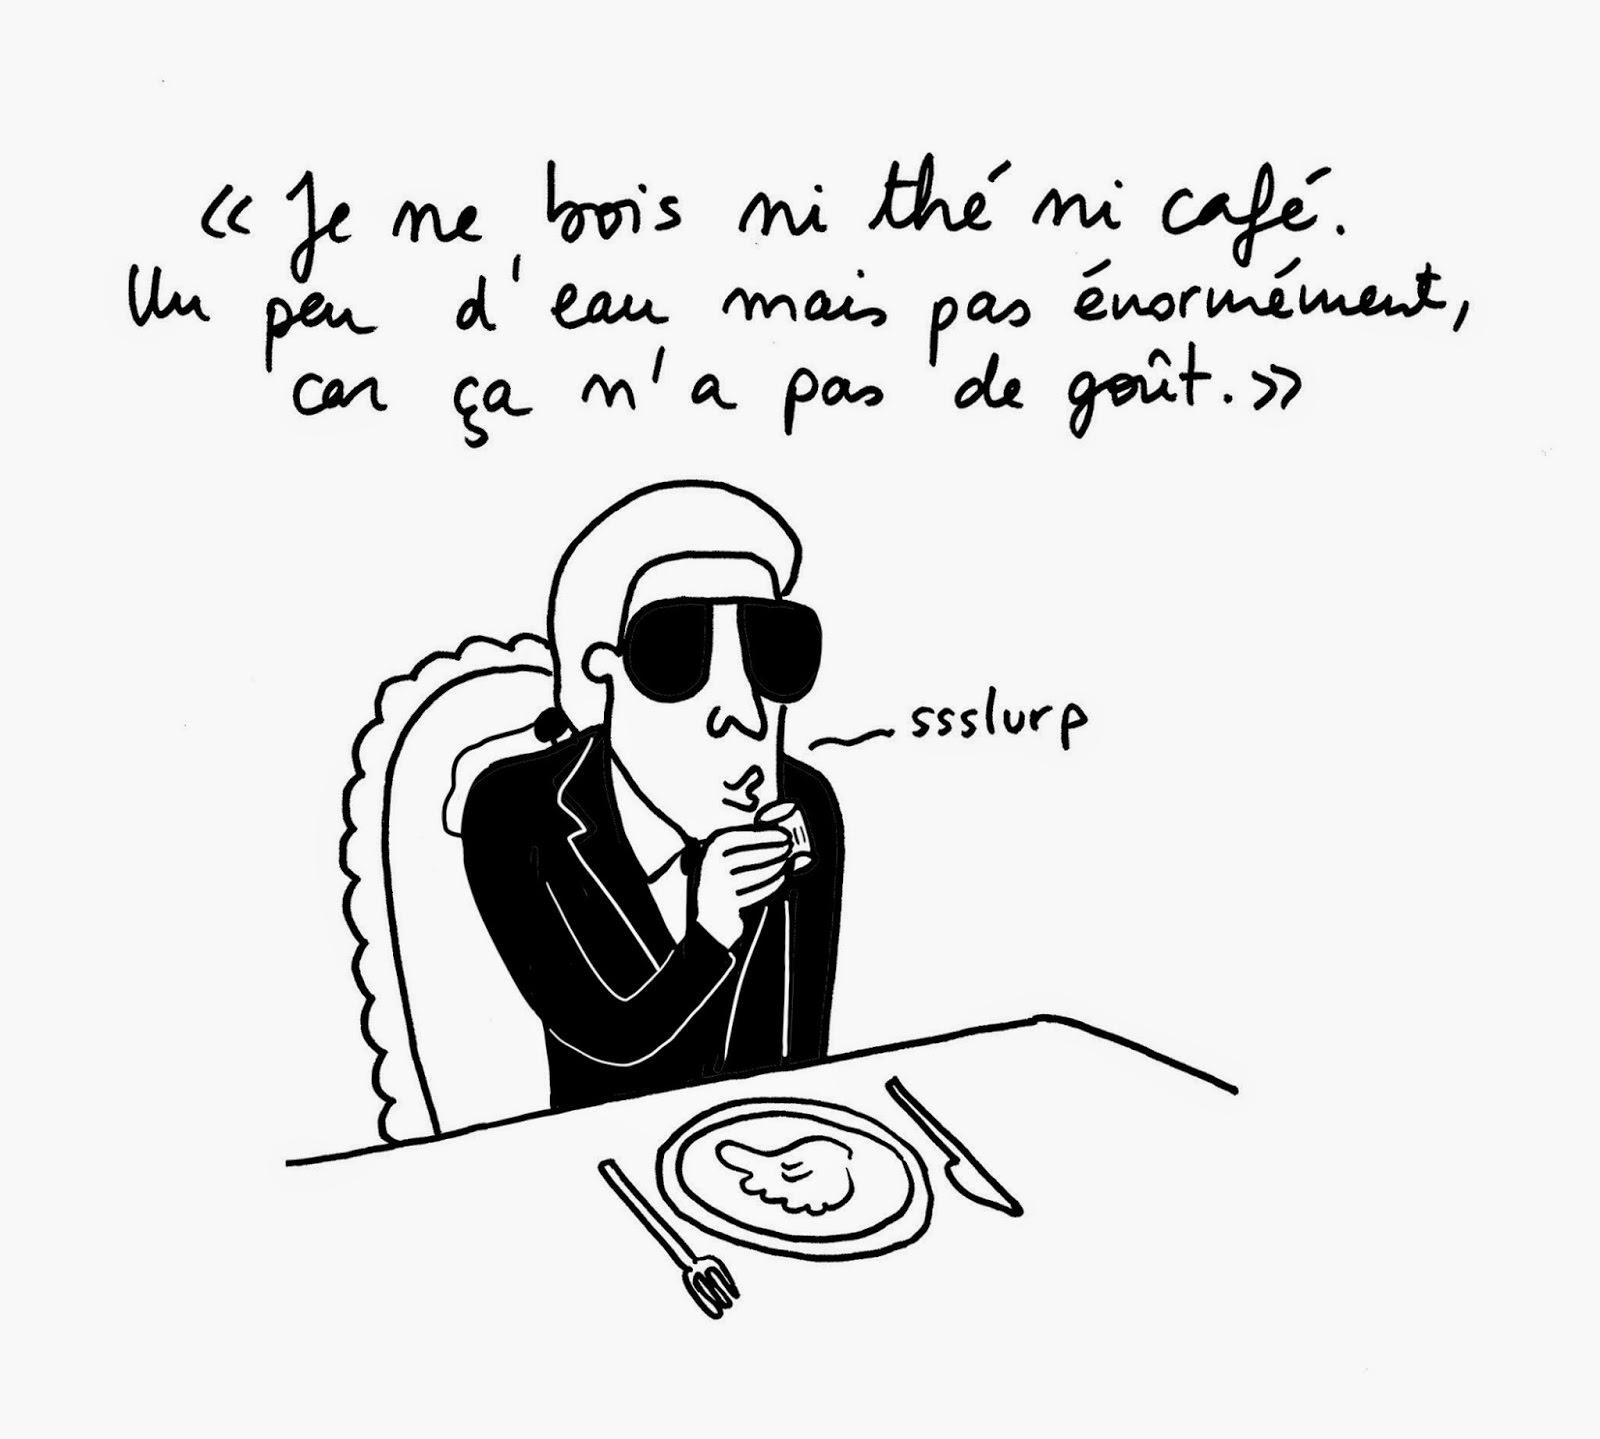 Karl Lagerfeld x Tiffany Cooper – Le vernissage de choupette